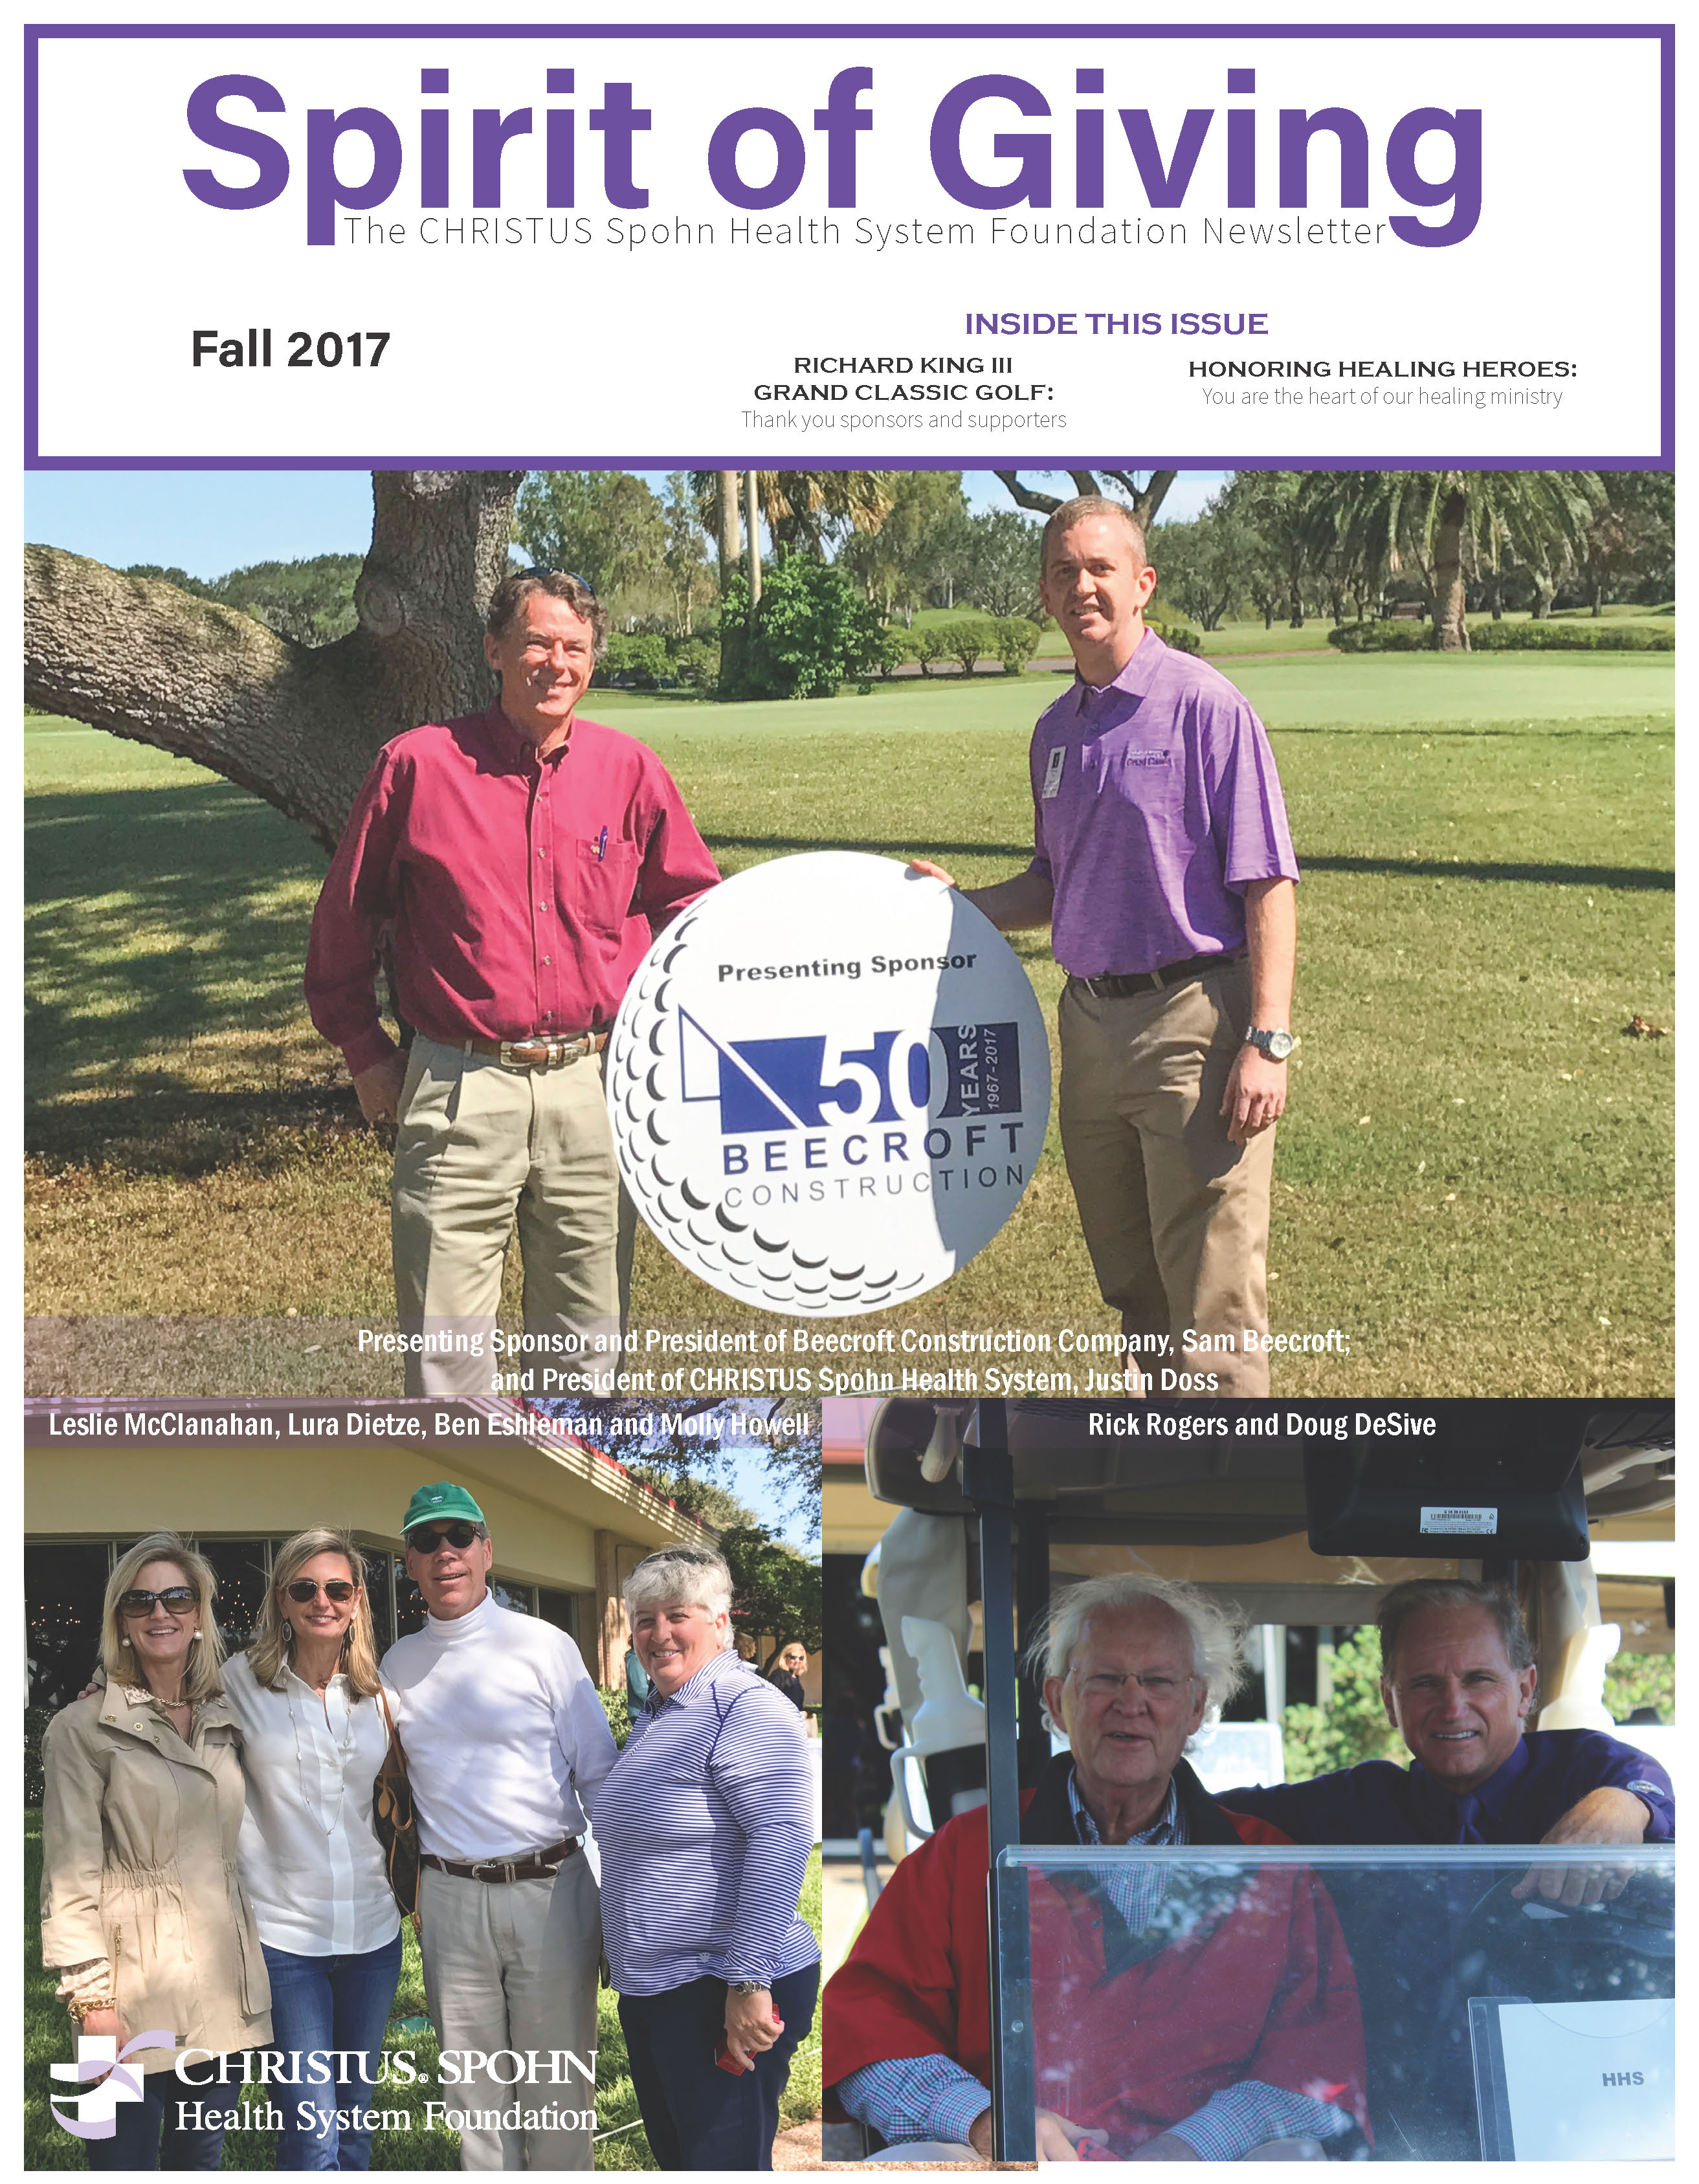 Newsletter Cover Photo